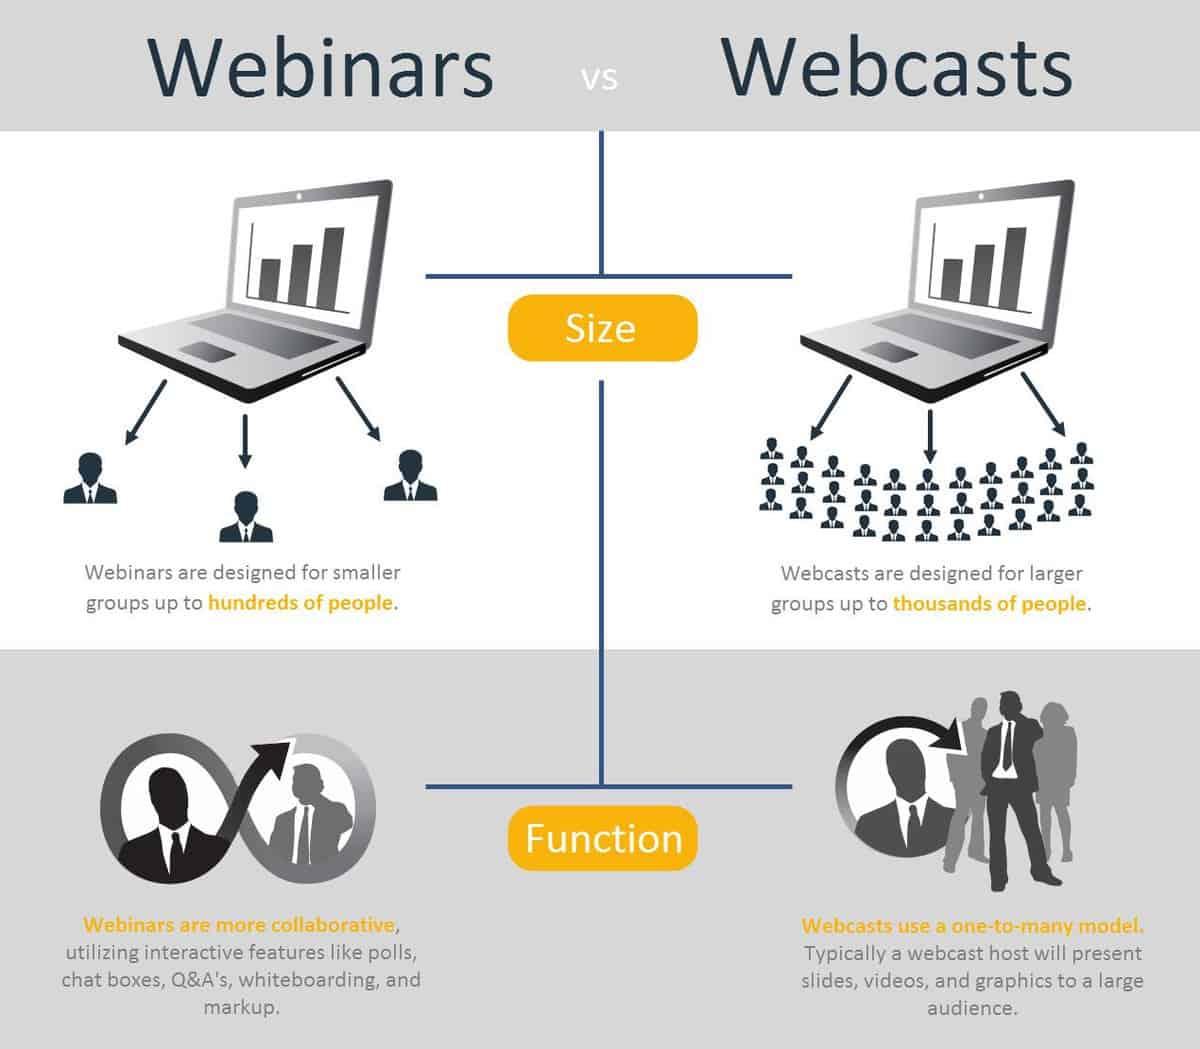 Webinars vs Webcasts